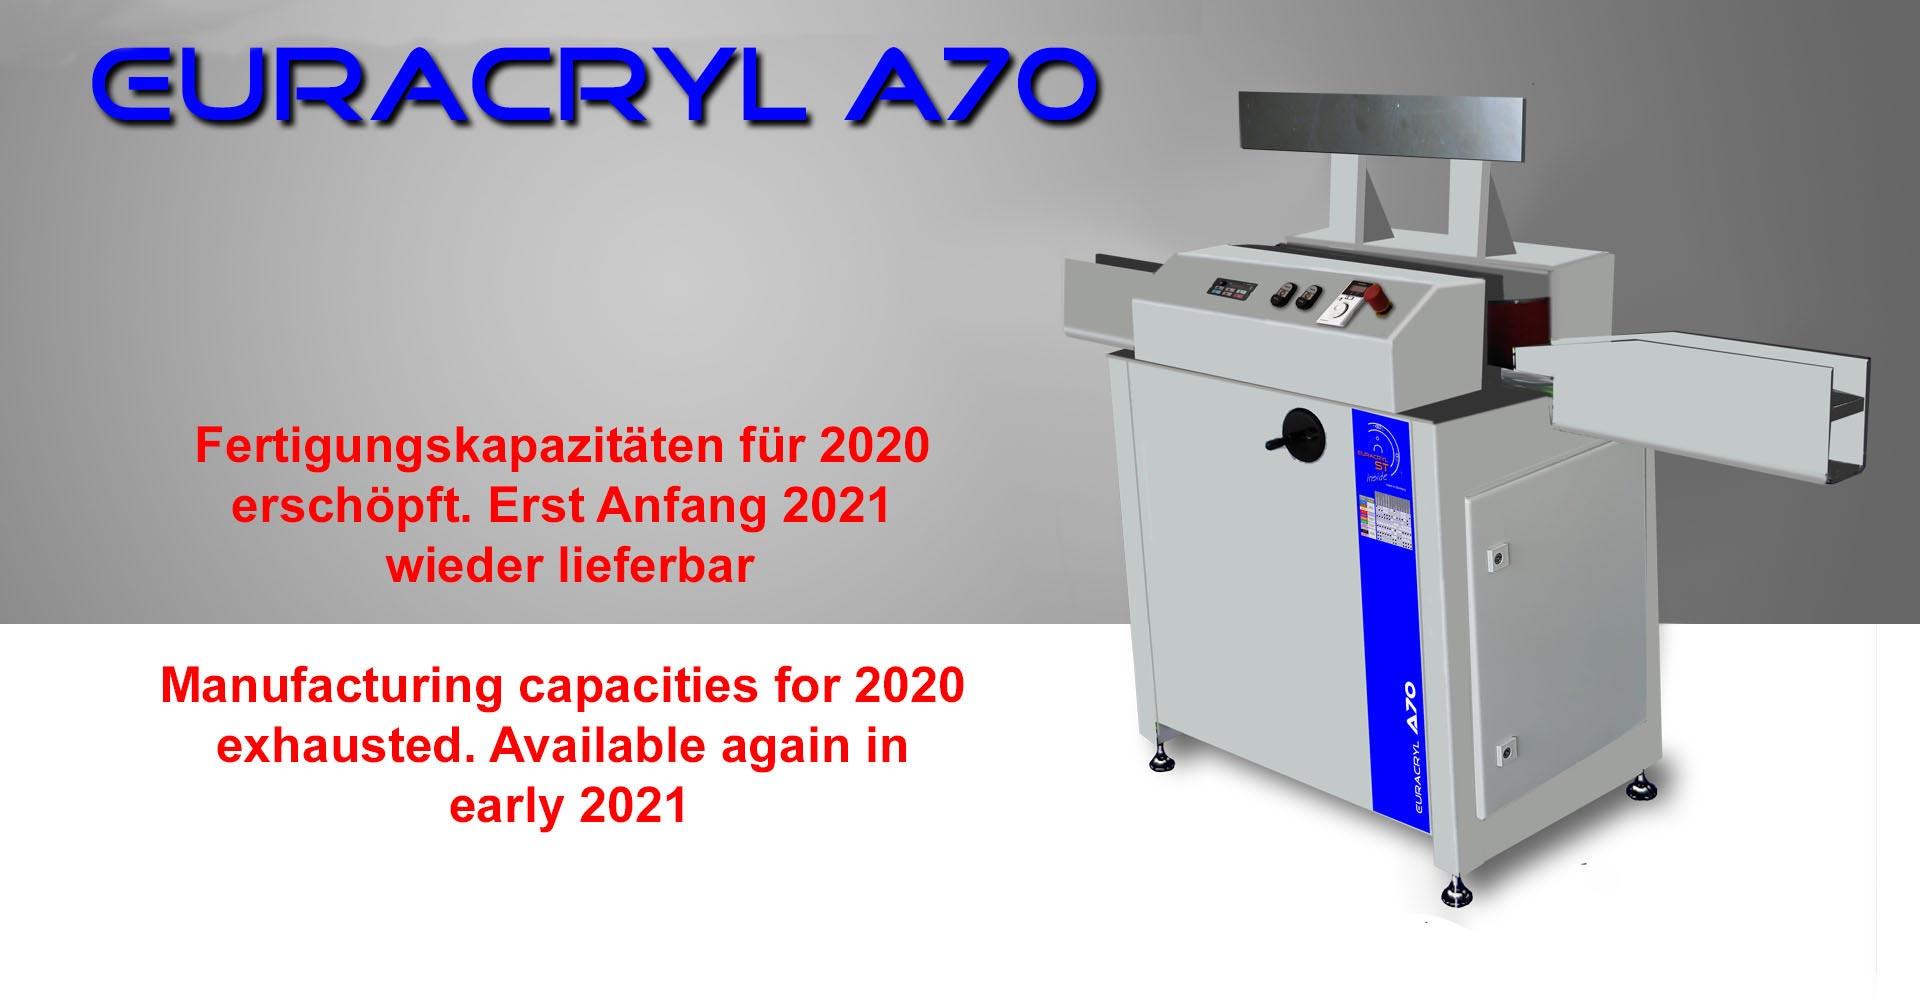 pulidora de cantos vertical a70 - vertical poliermaschine a70 - a70 vertical posishing machine